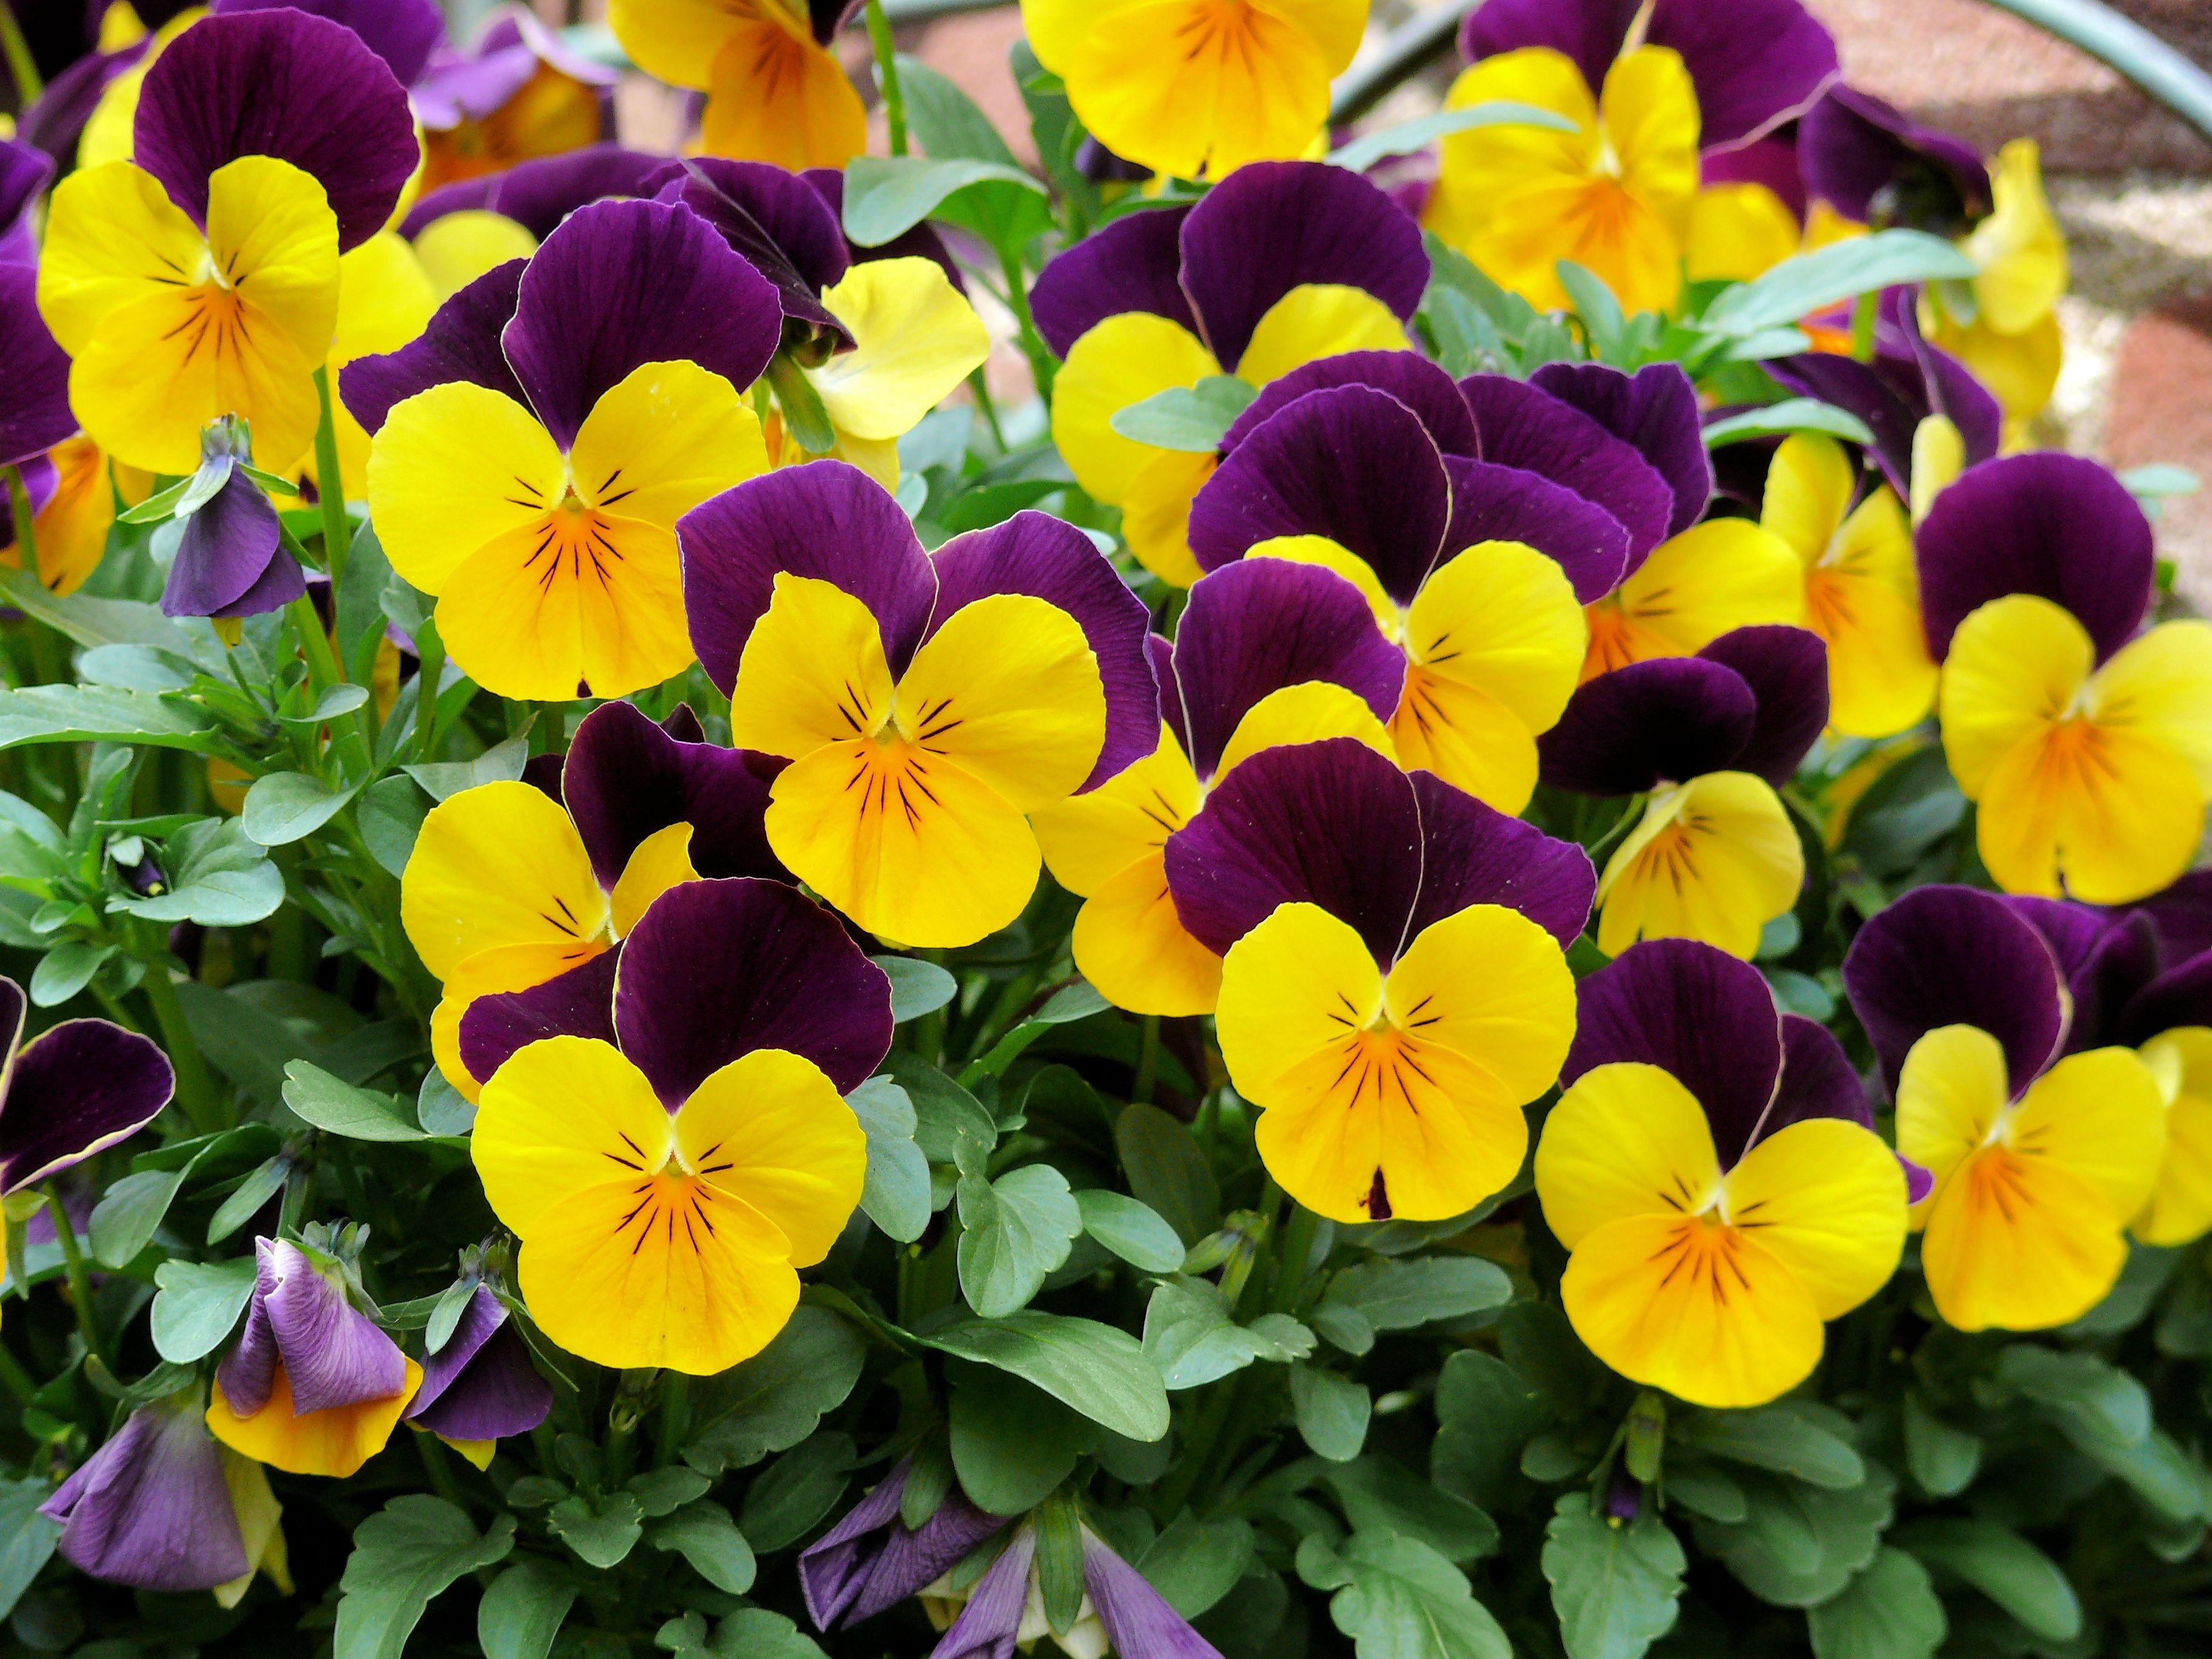 Free Images Flower Purple Petal Spring Botany Yellow Garden